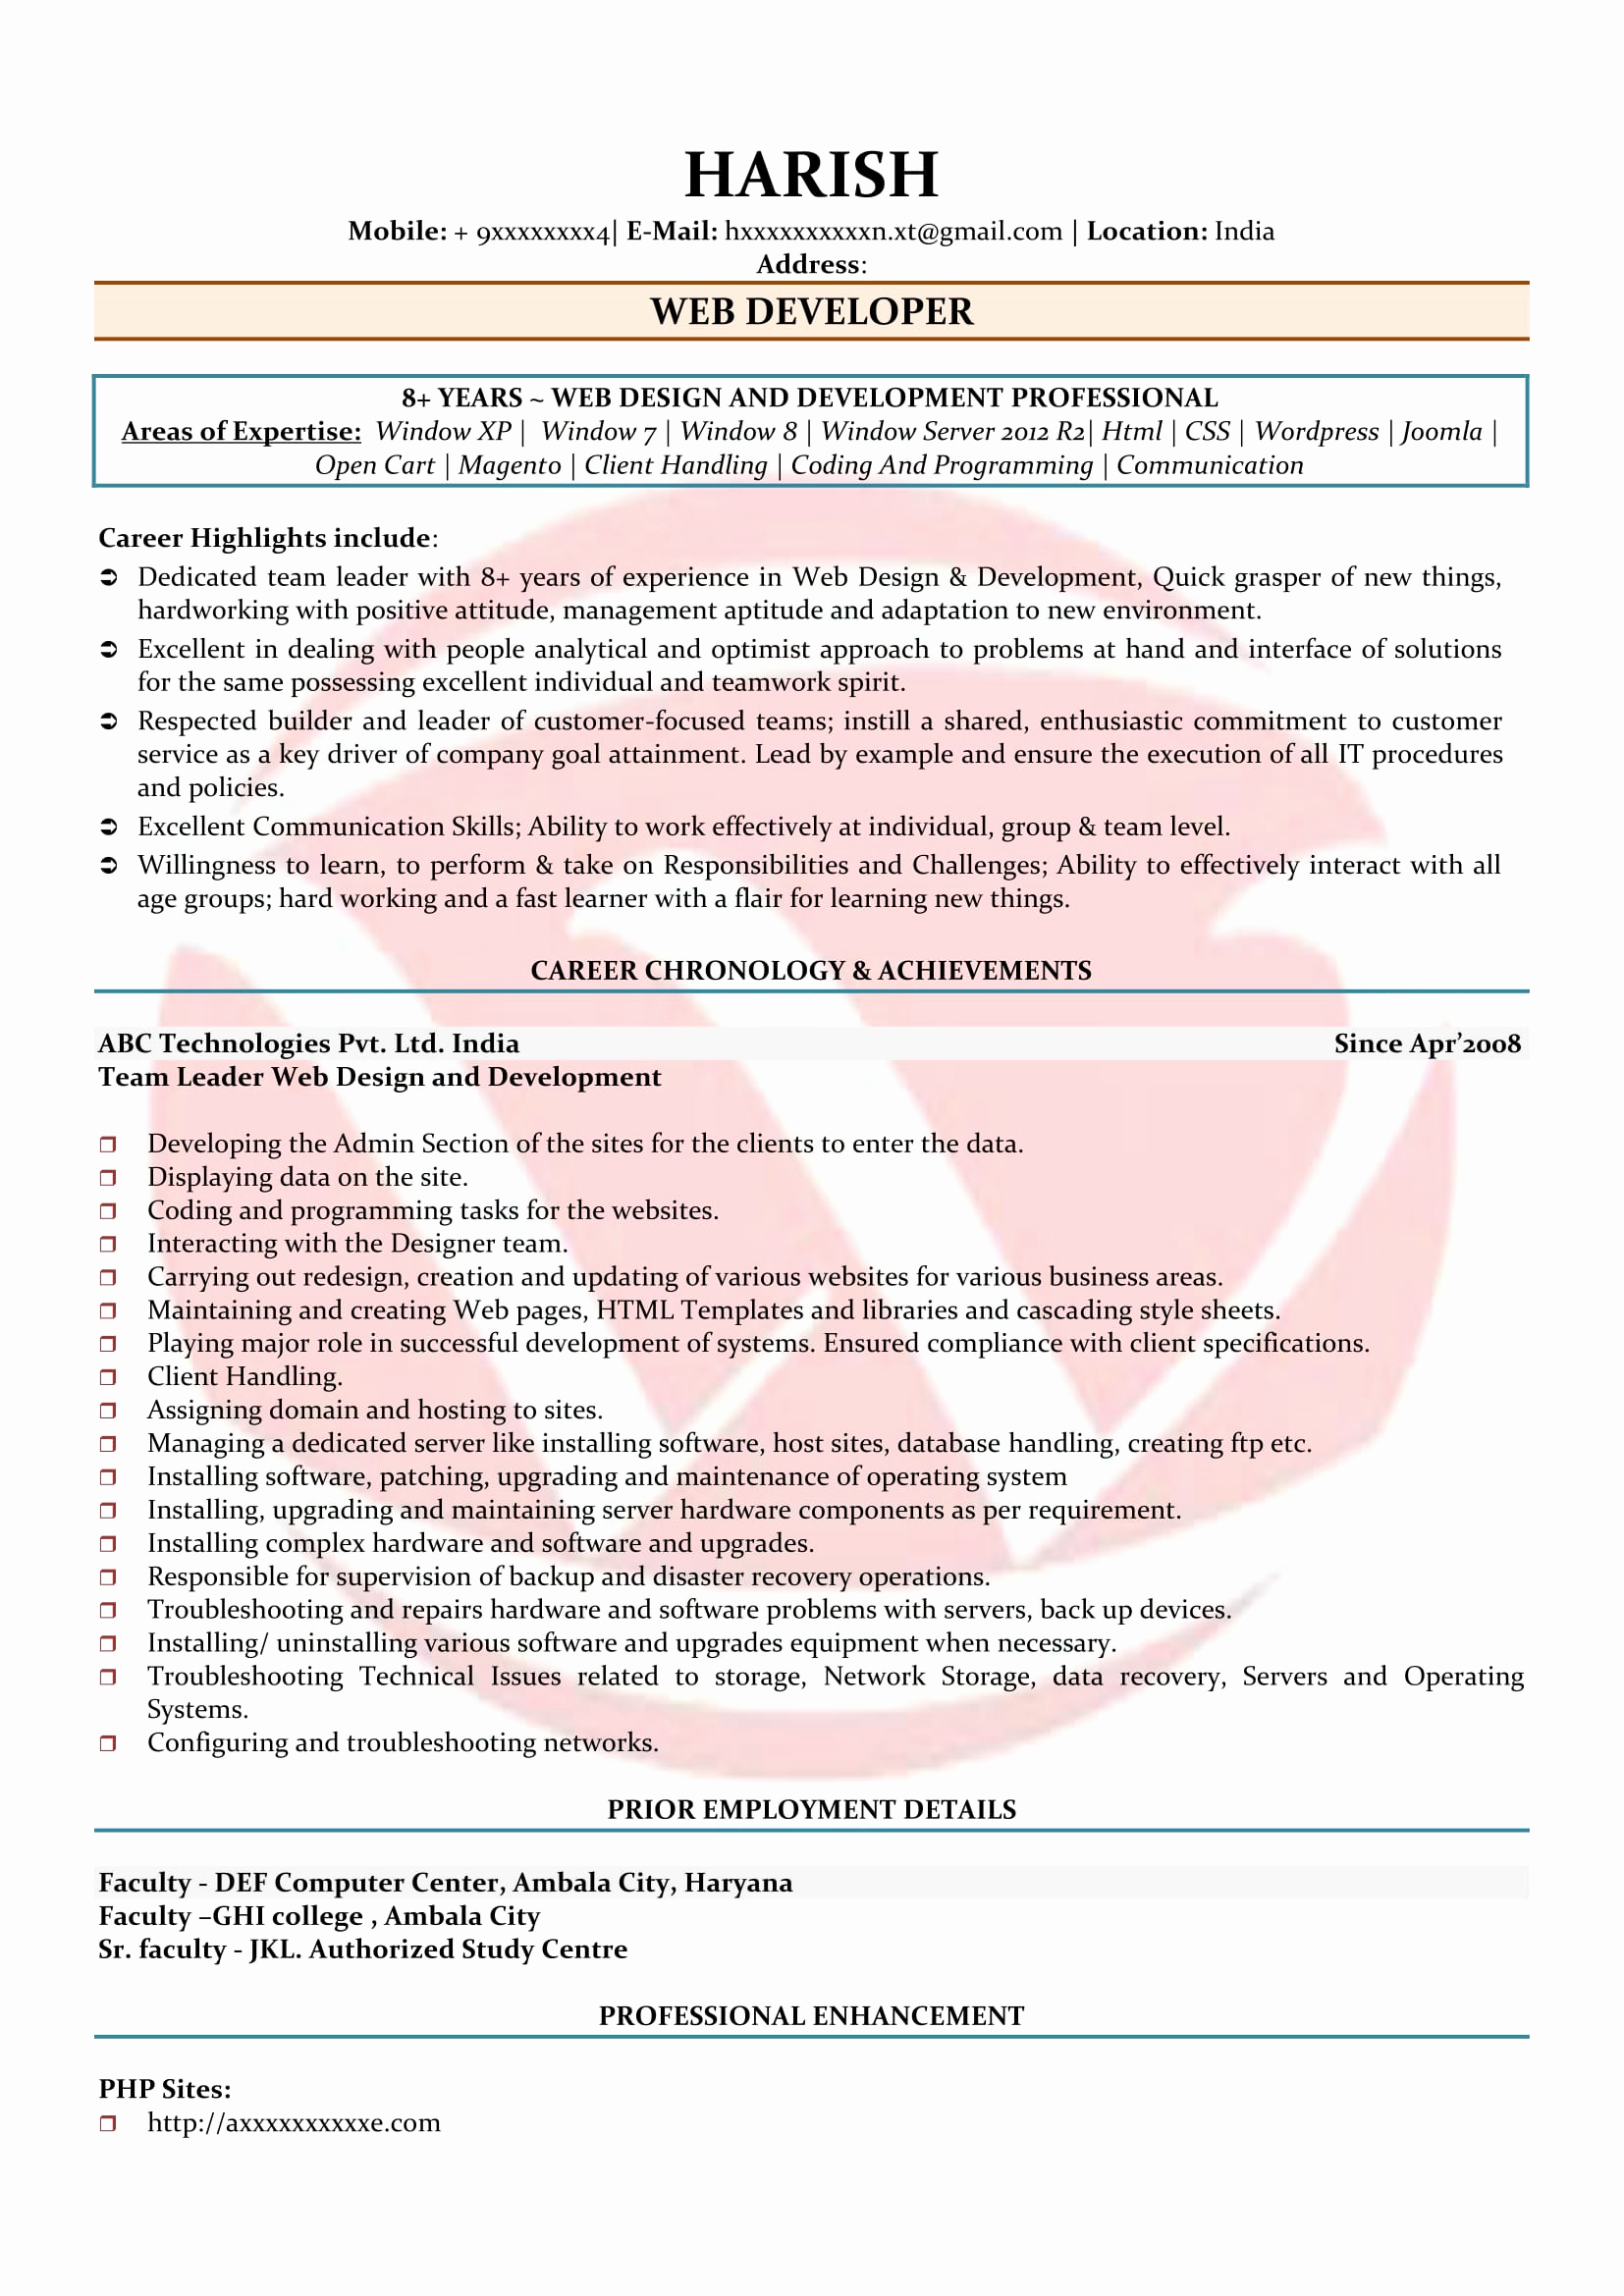 Web Developer Resume Sample New Web Developer Sample Resumes Download Resume format